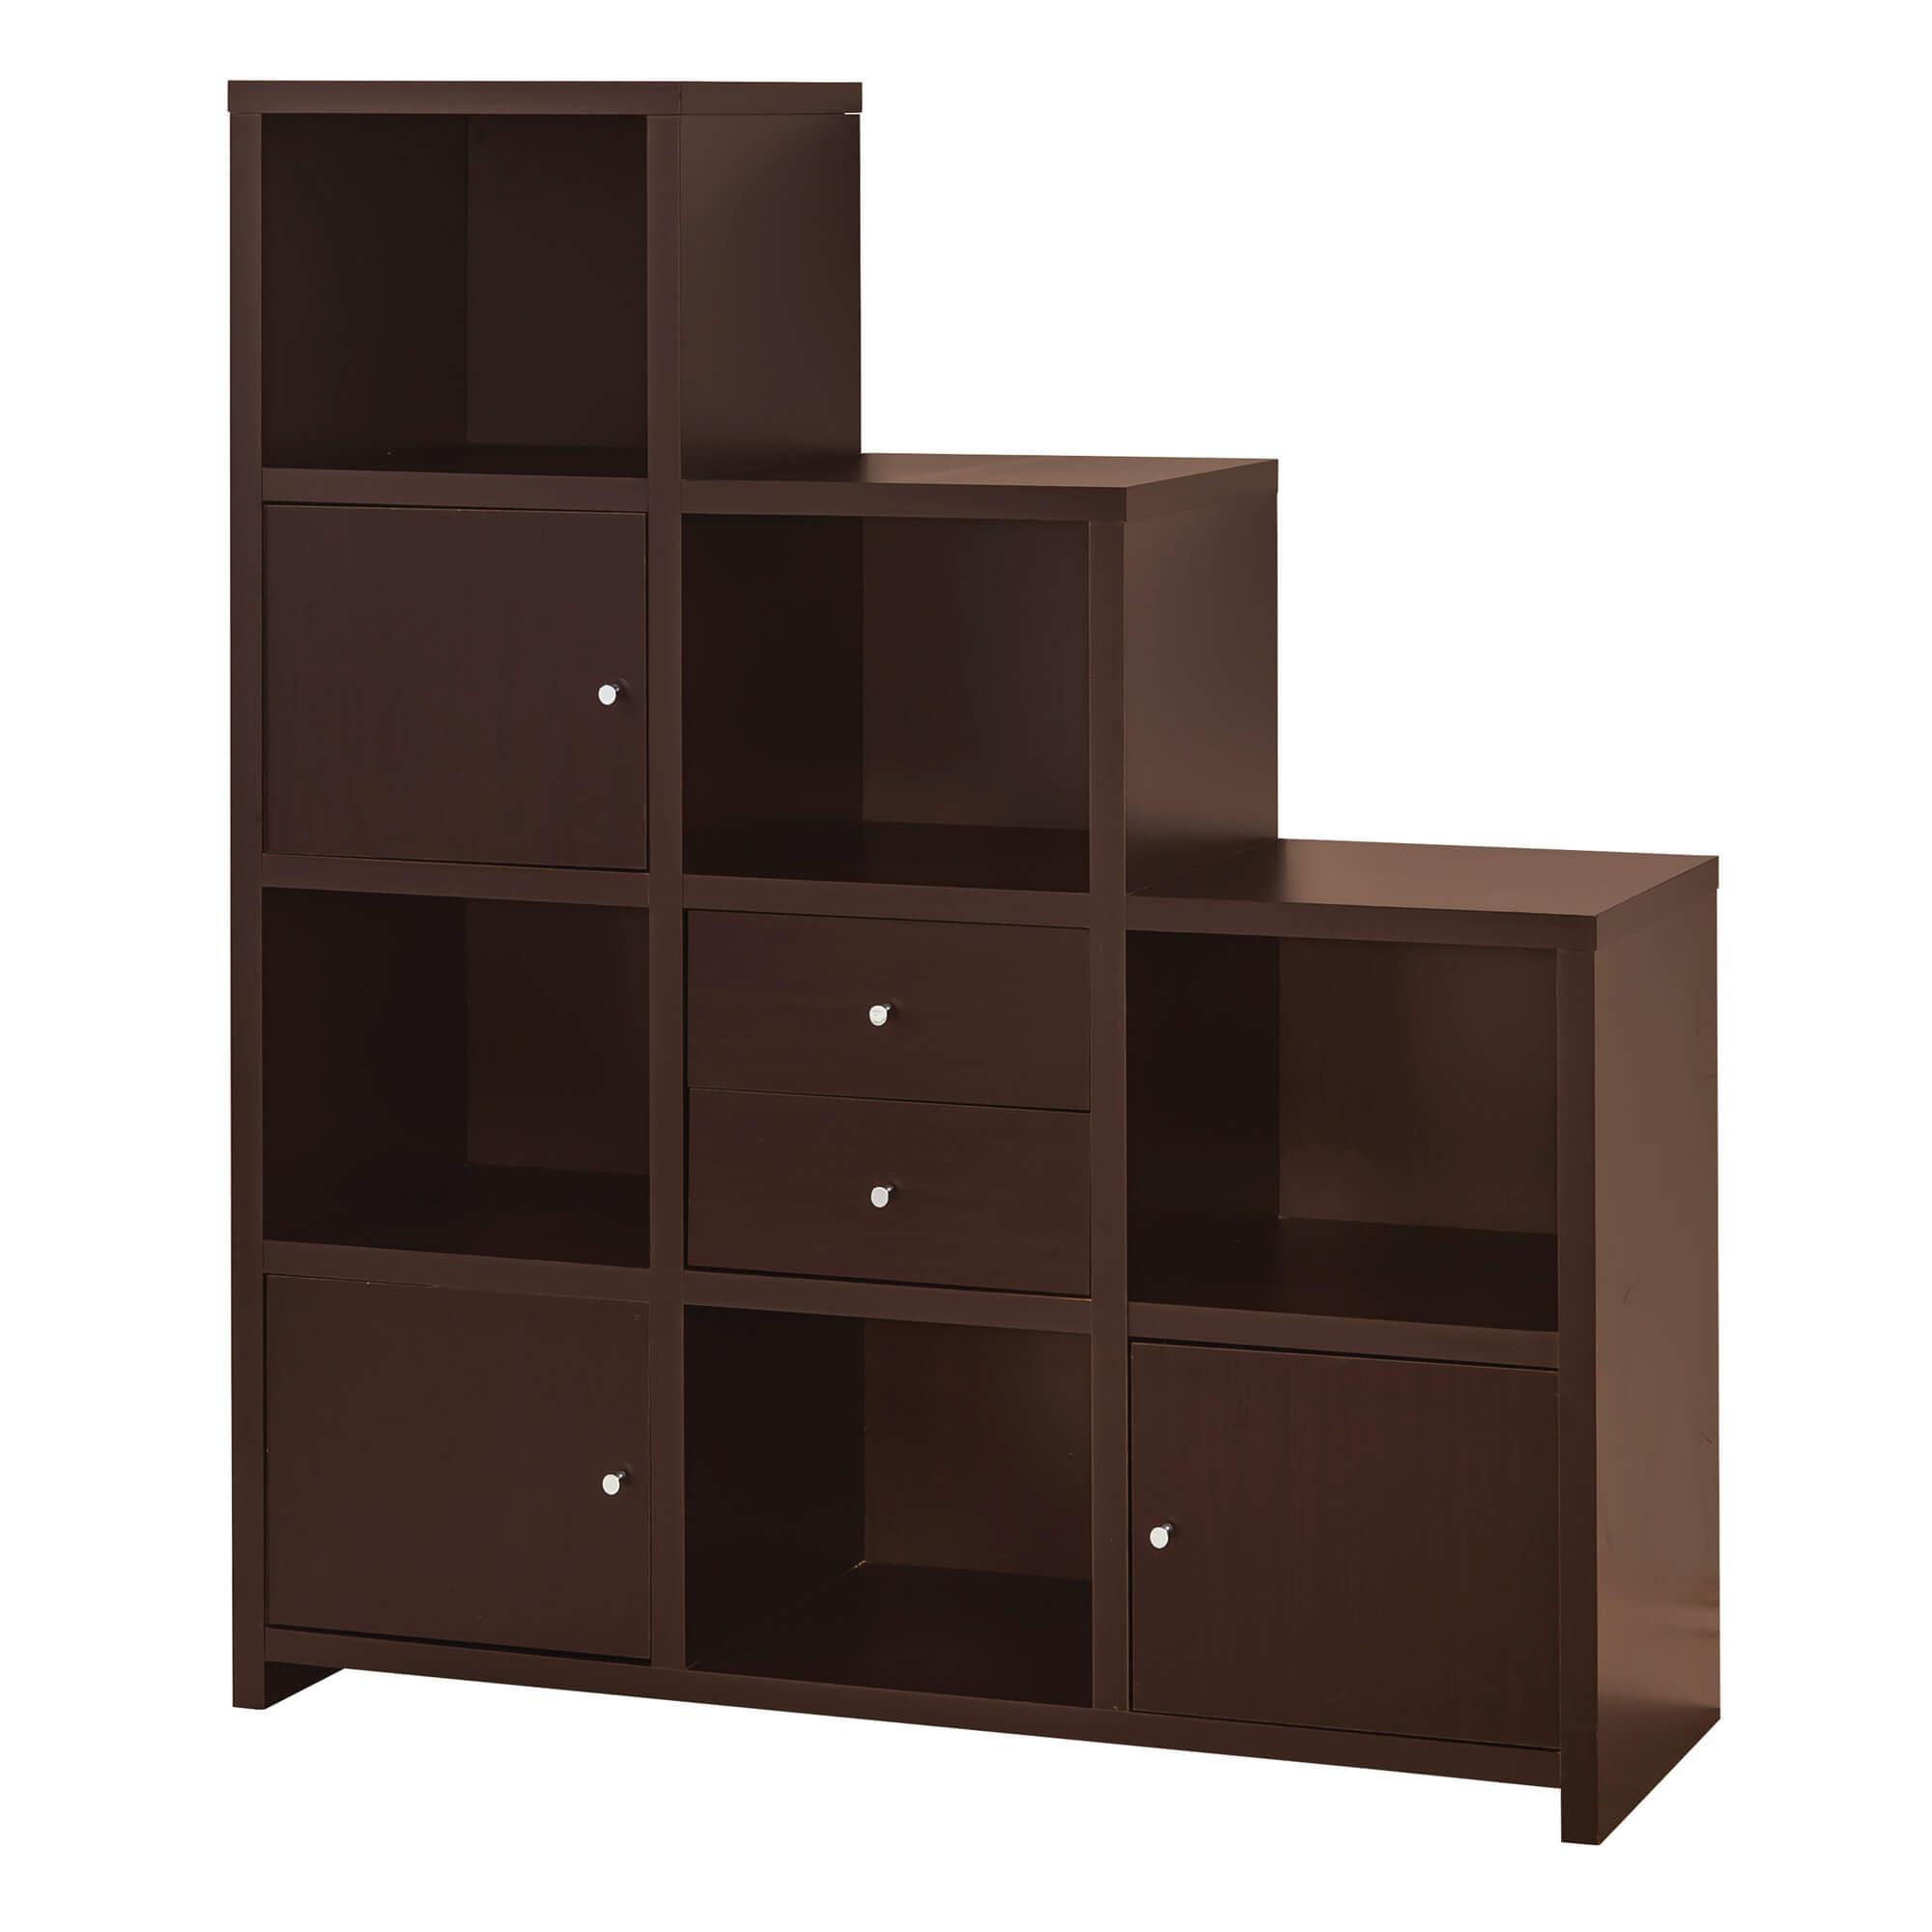 Twenty cube bookcases shelves and storage options